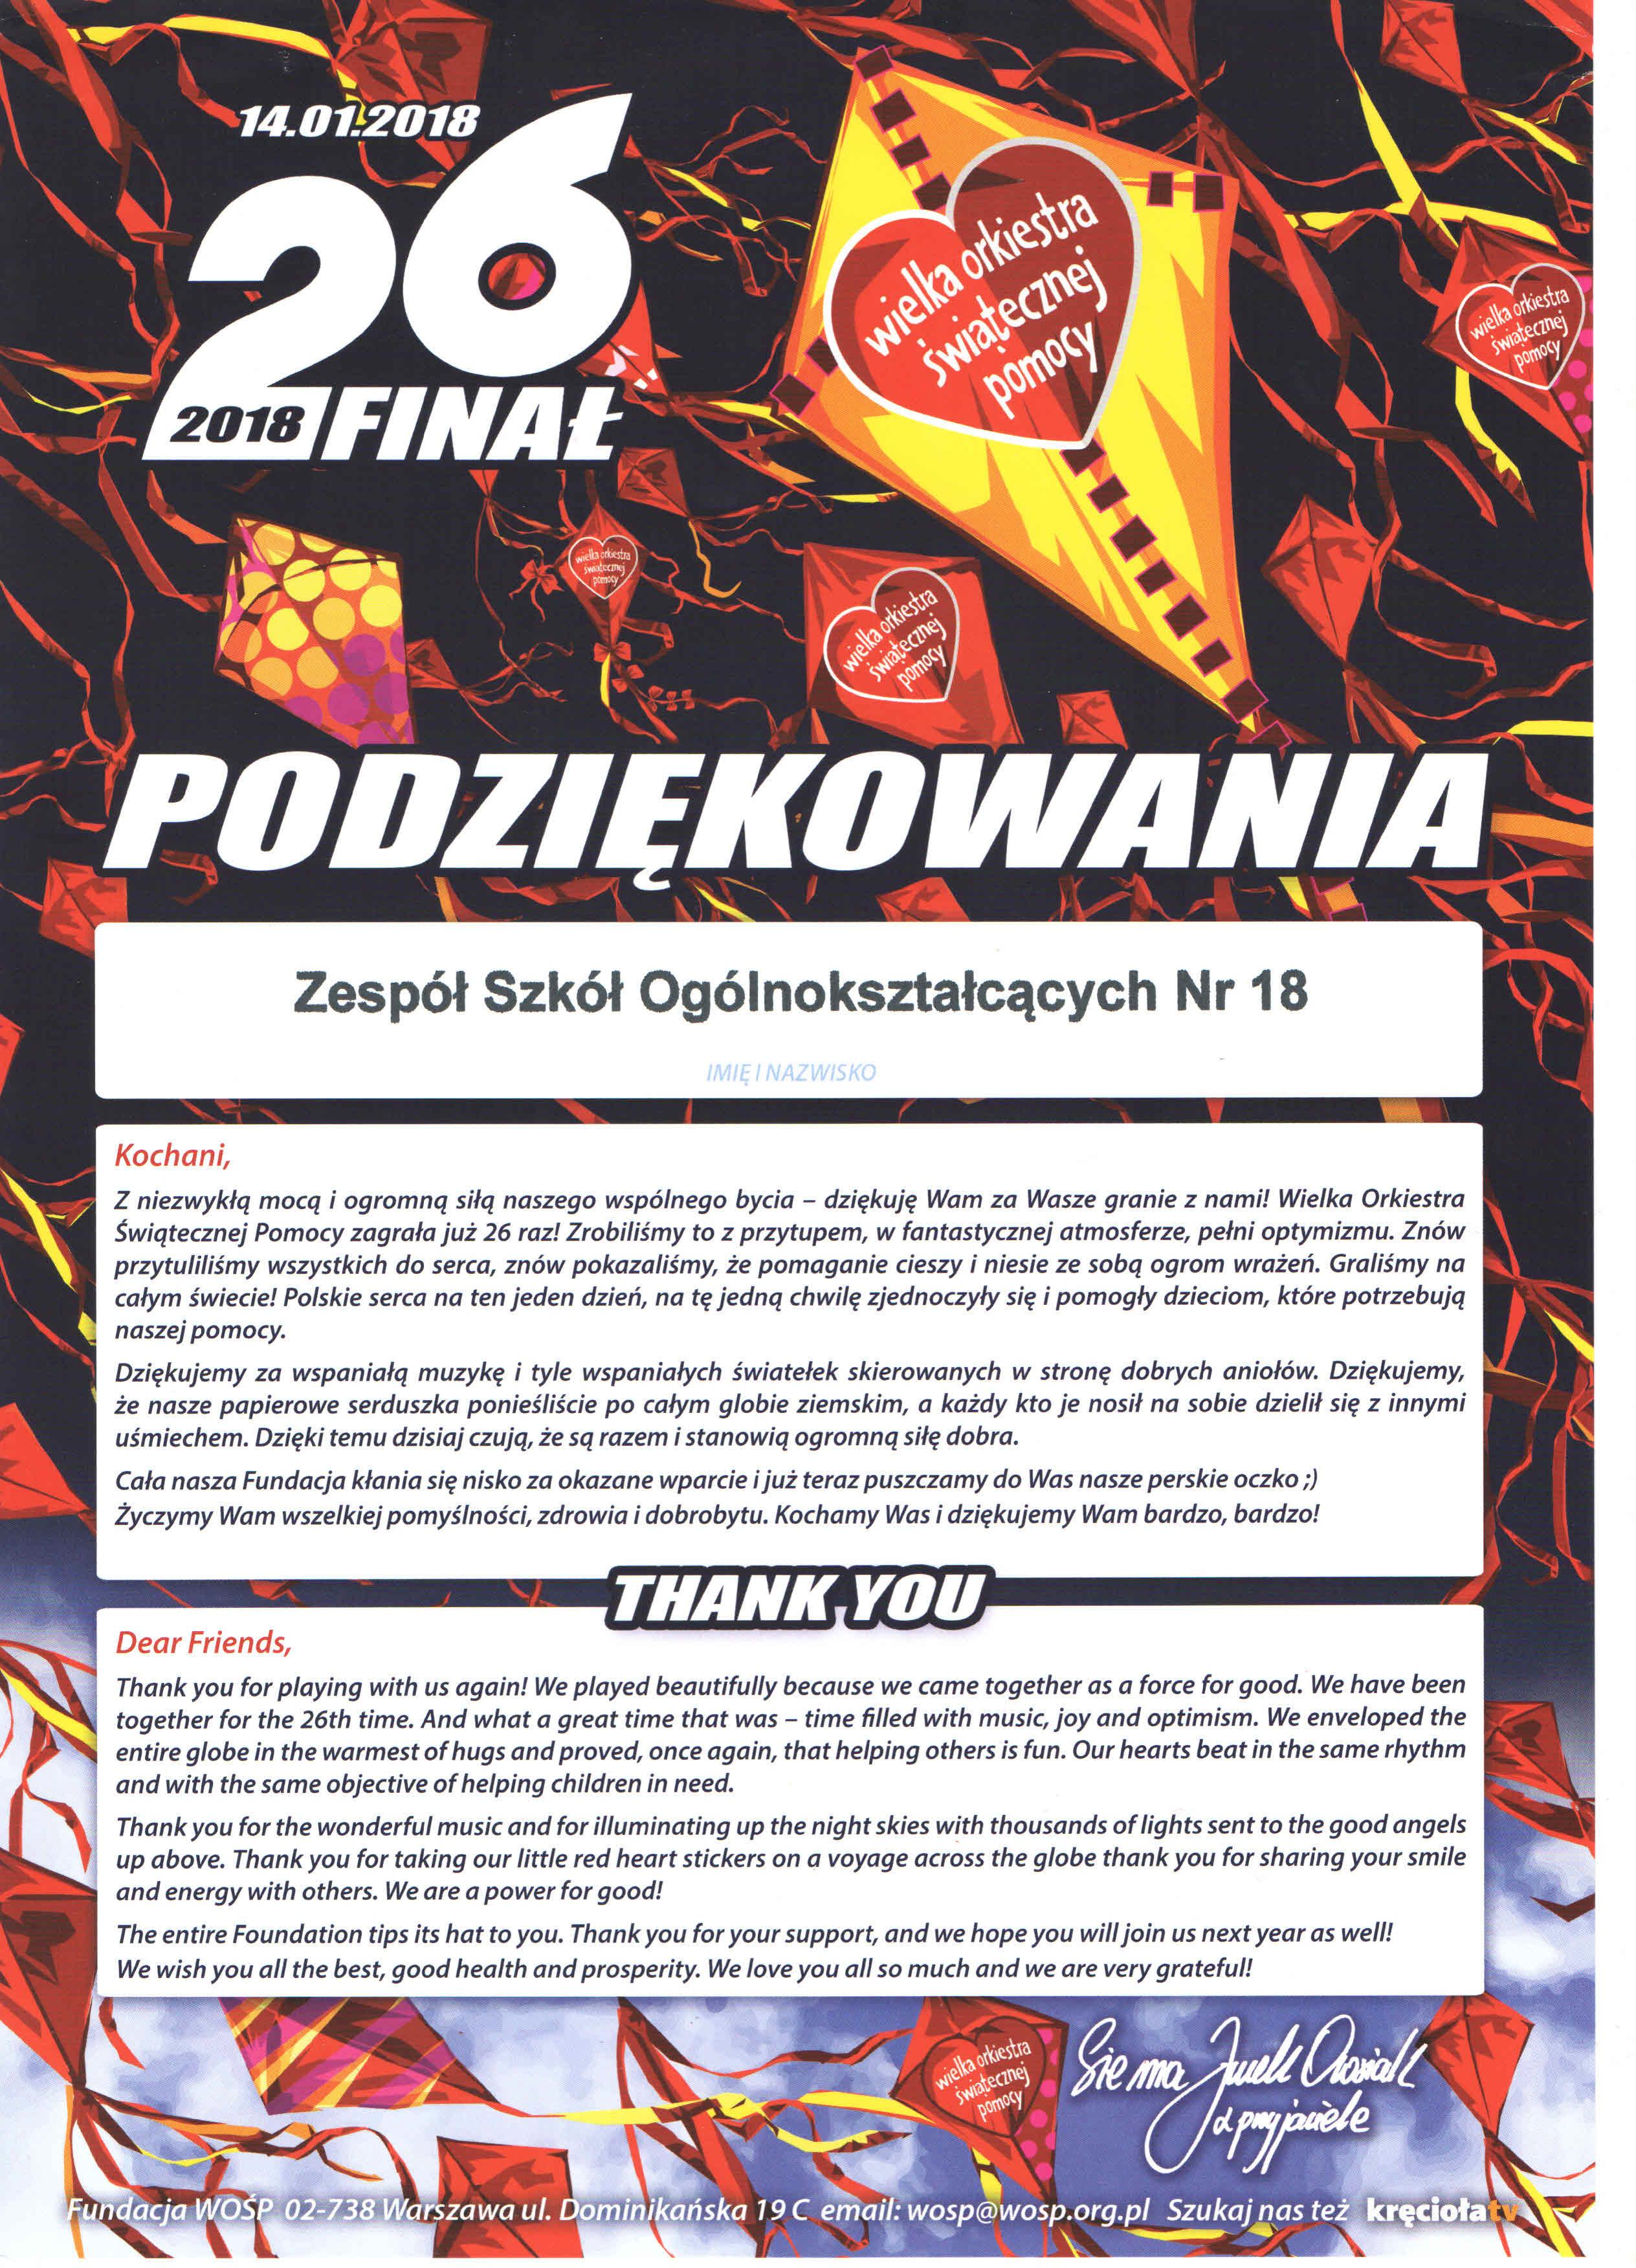 http://zso18.krakow.pl/wp-content/uploads/2018/03/podziekowaniewosp2018.jpg